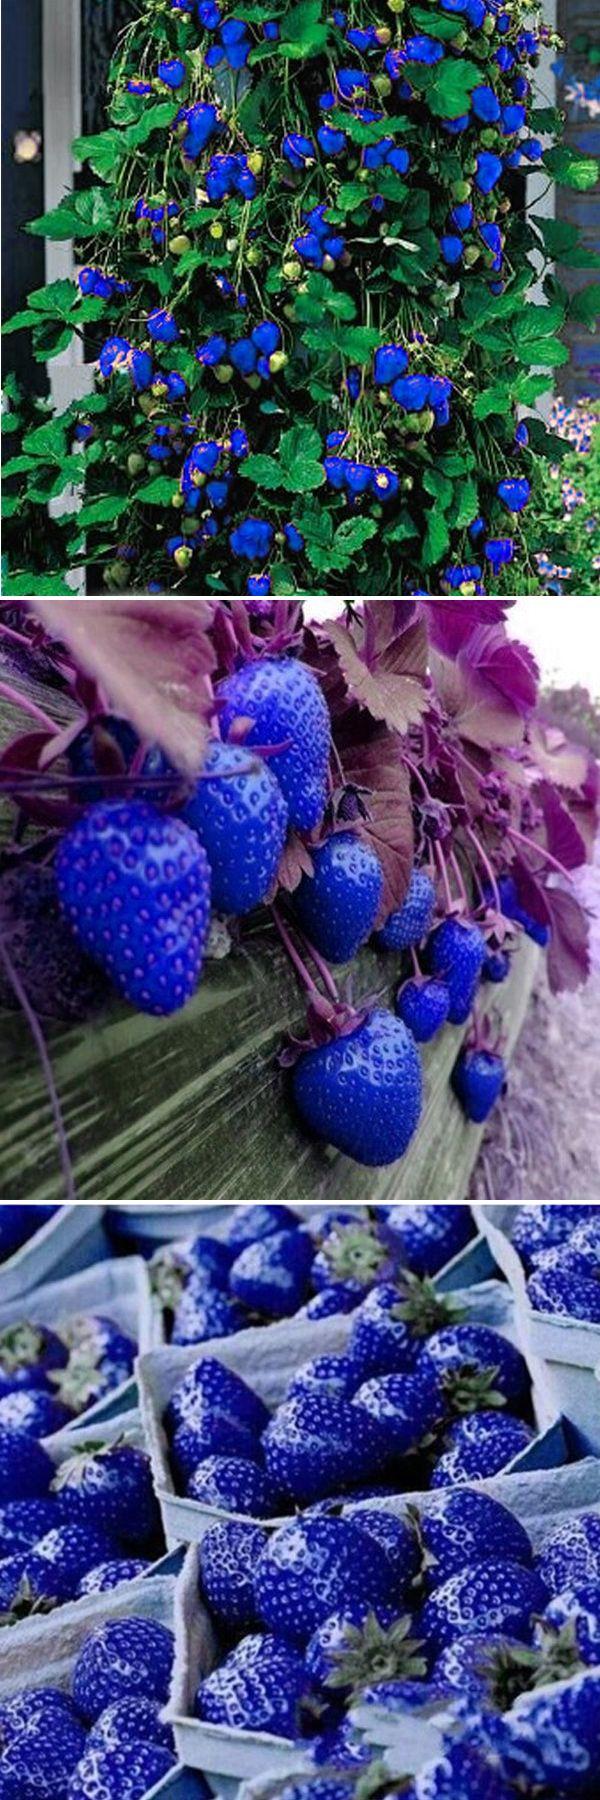 500Pcs Blue Strawberry Rare Fruit Vegetable Seeds Bonsai Edible Garden Climbing Plant #plant #strawberry #bonsai #GORGEOUS